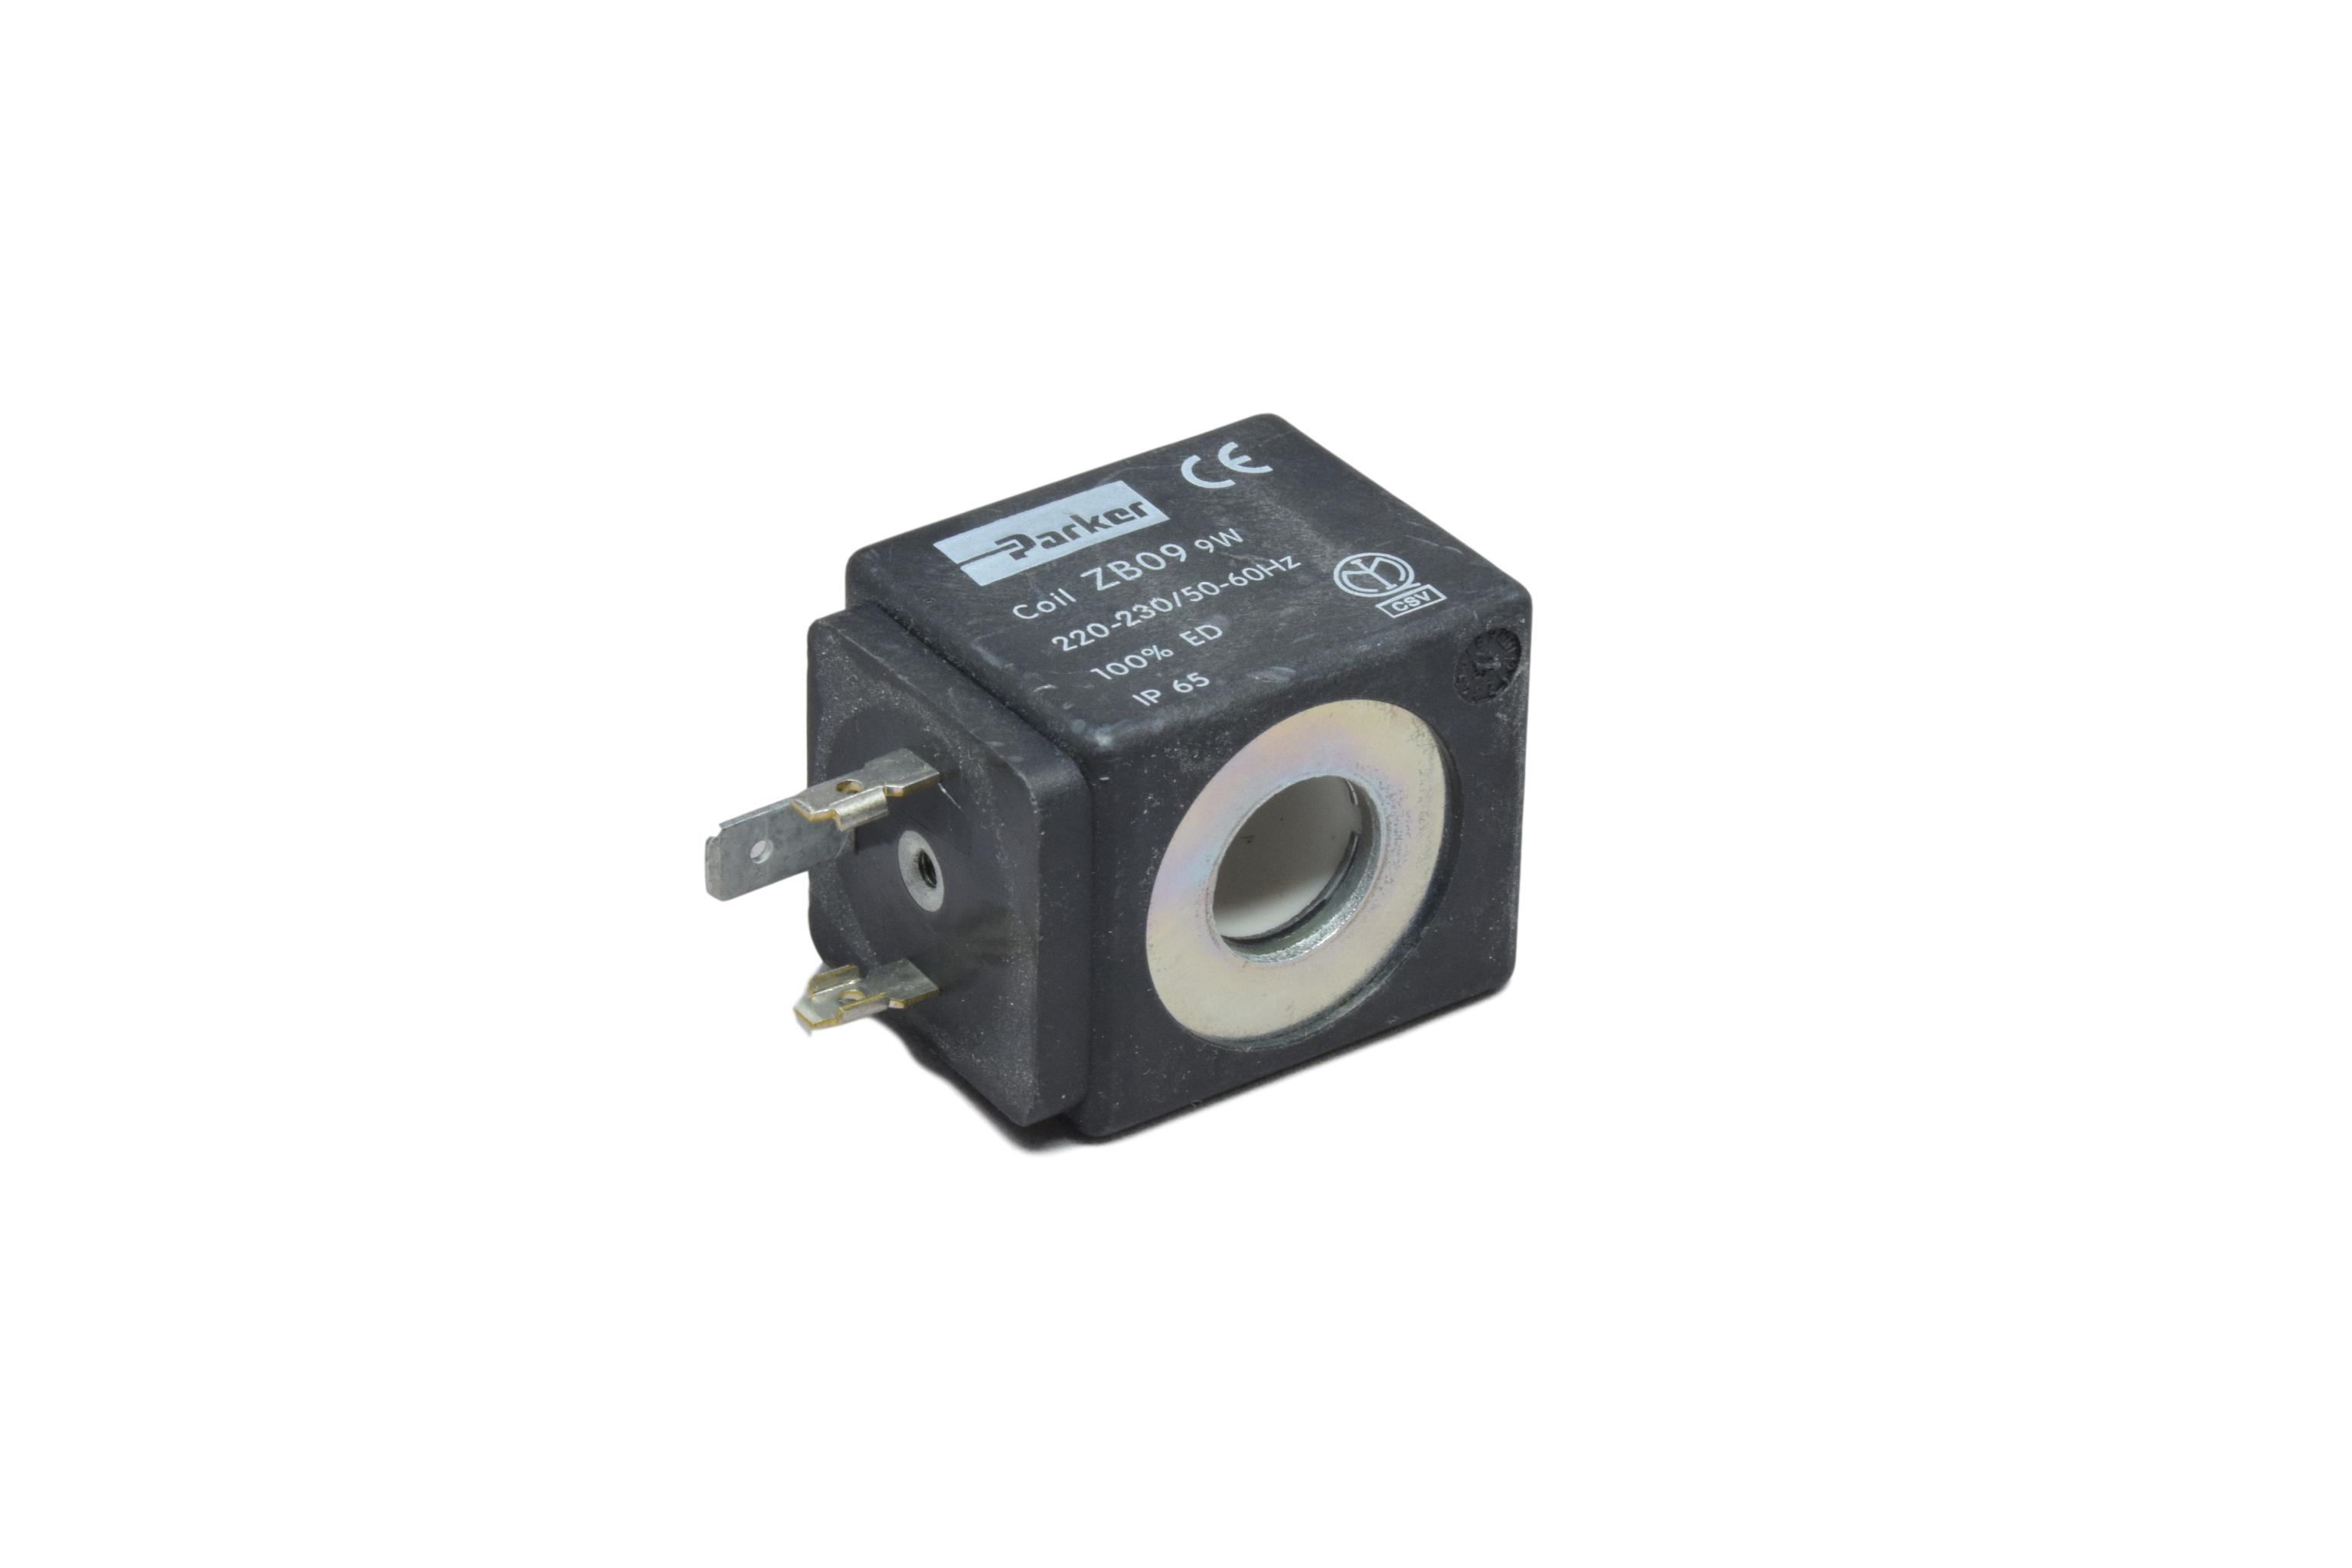 Solenoid valve elektromagnet